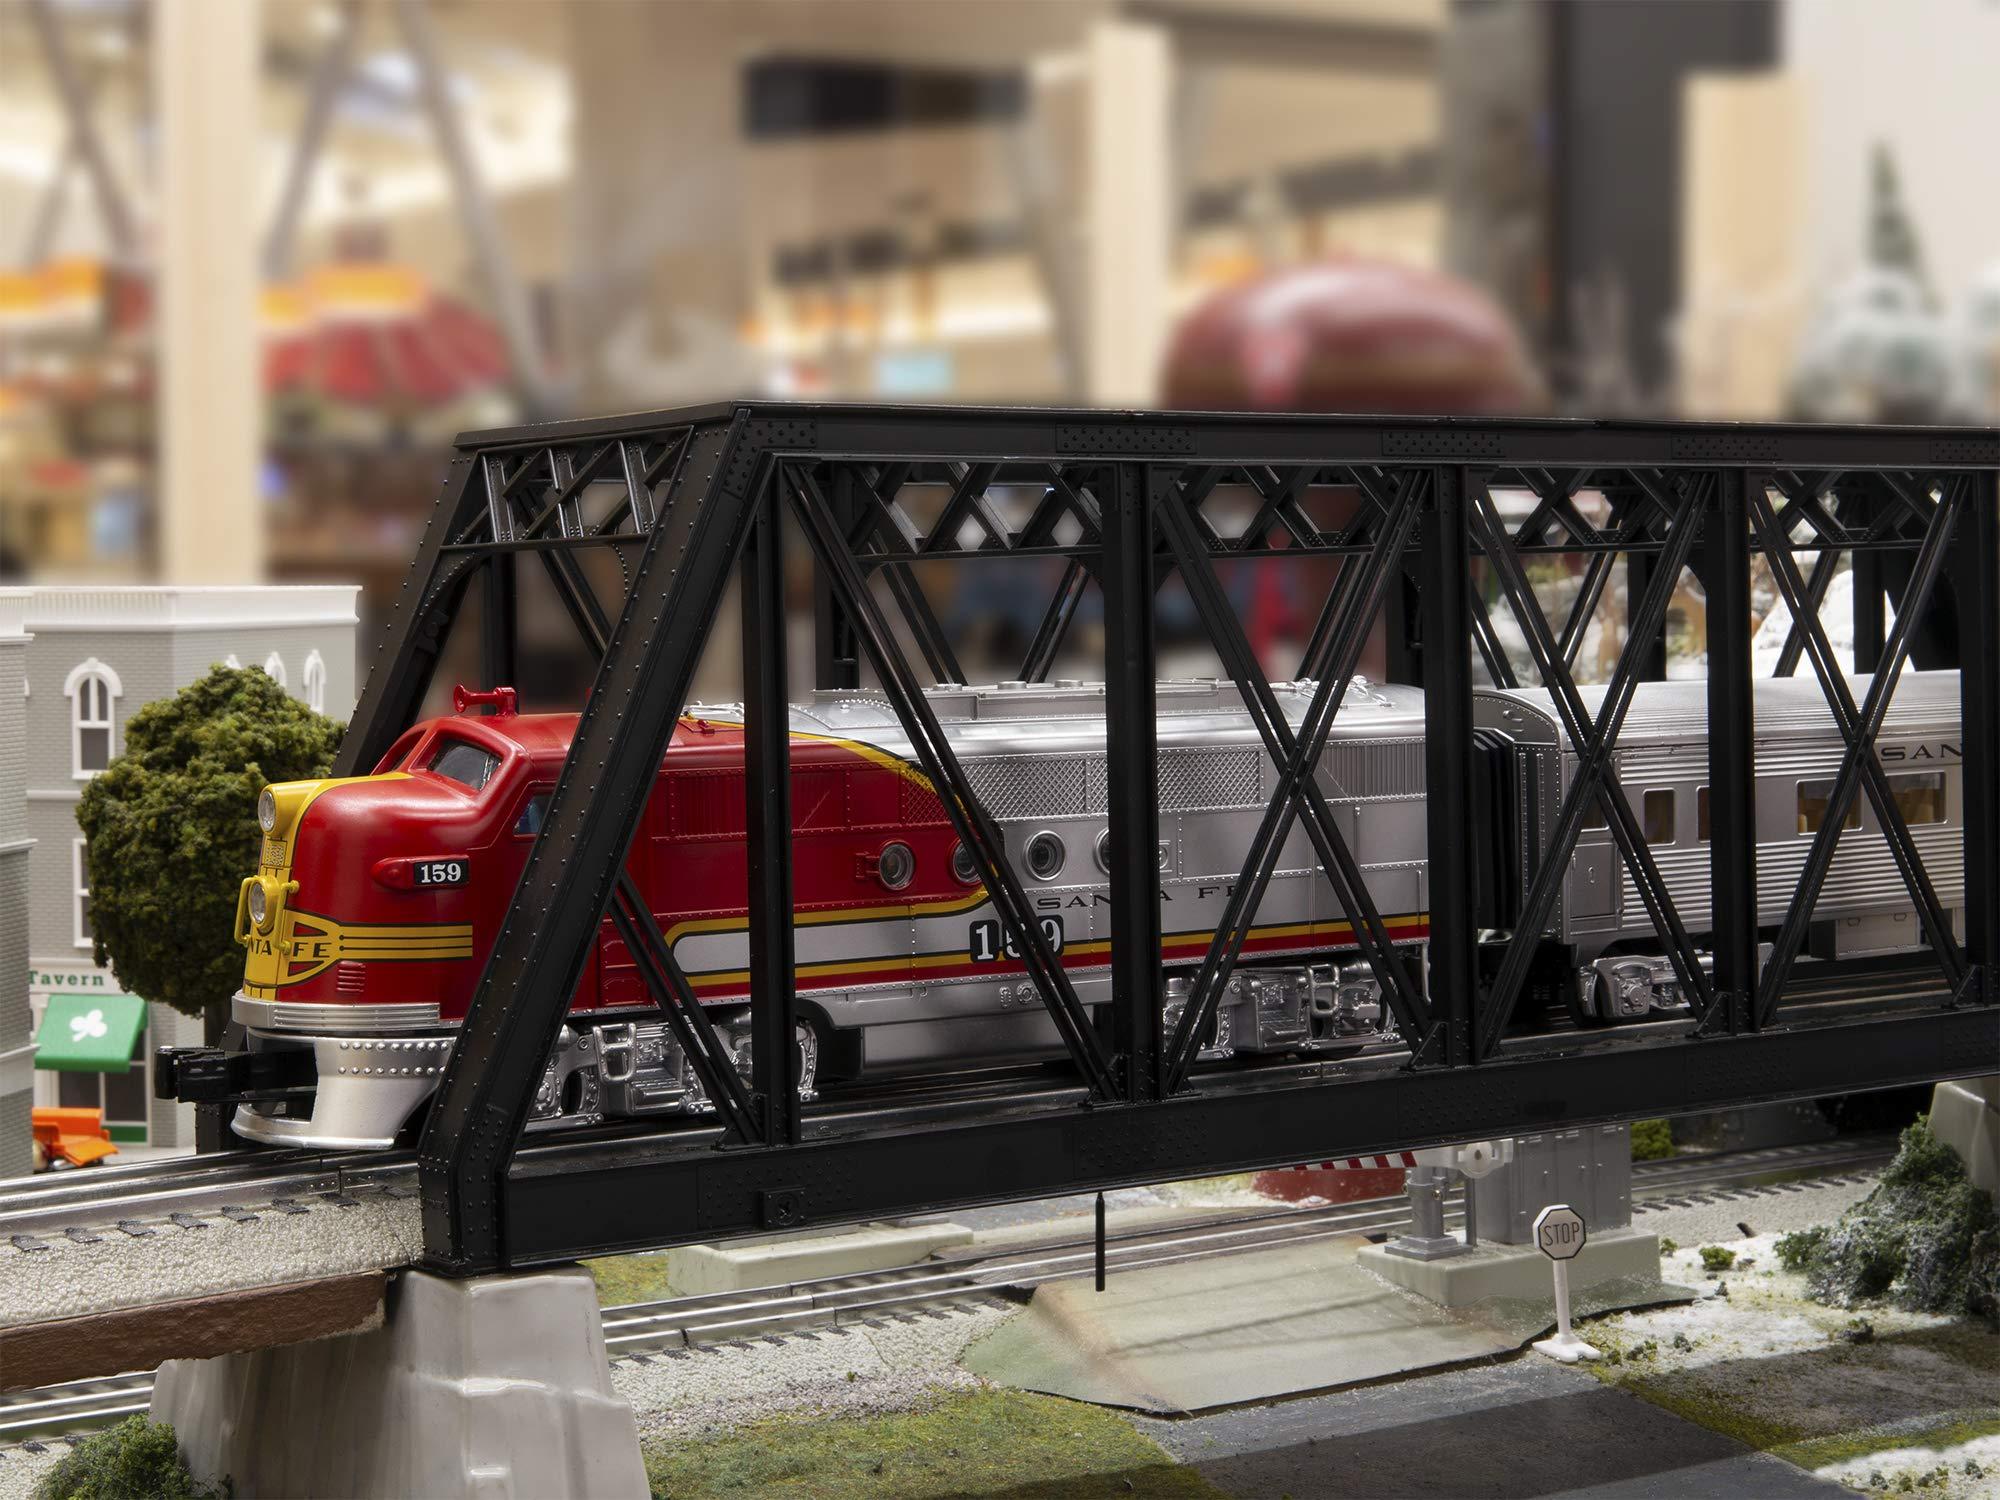 Lionel Santa Fe Super Chief Electric O Gauge Model Train Set w/ Remote and Bluetooth Capability by Lionel (Image #10)